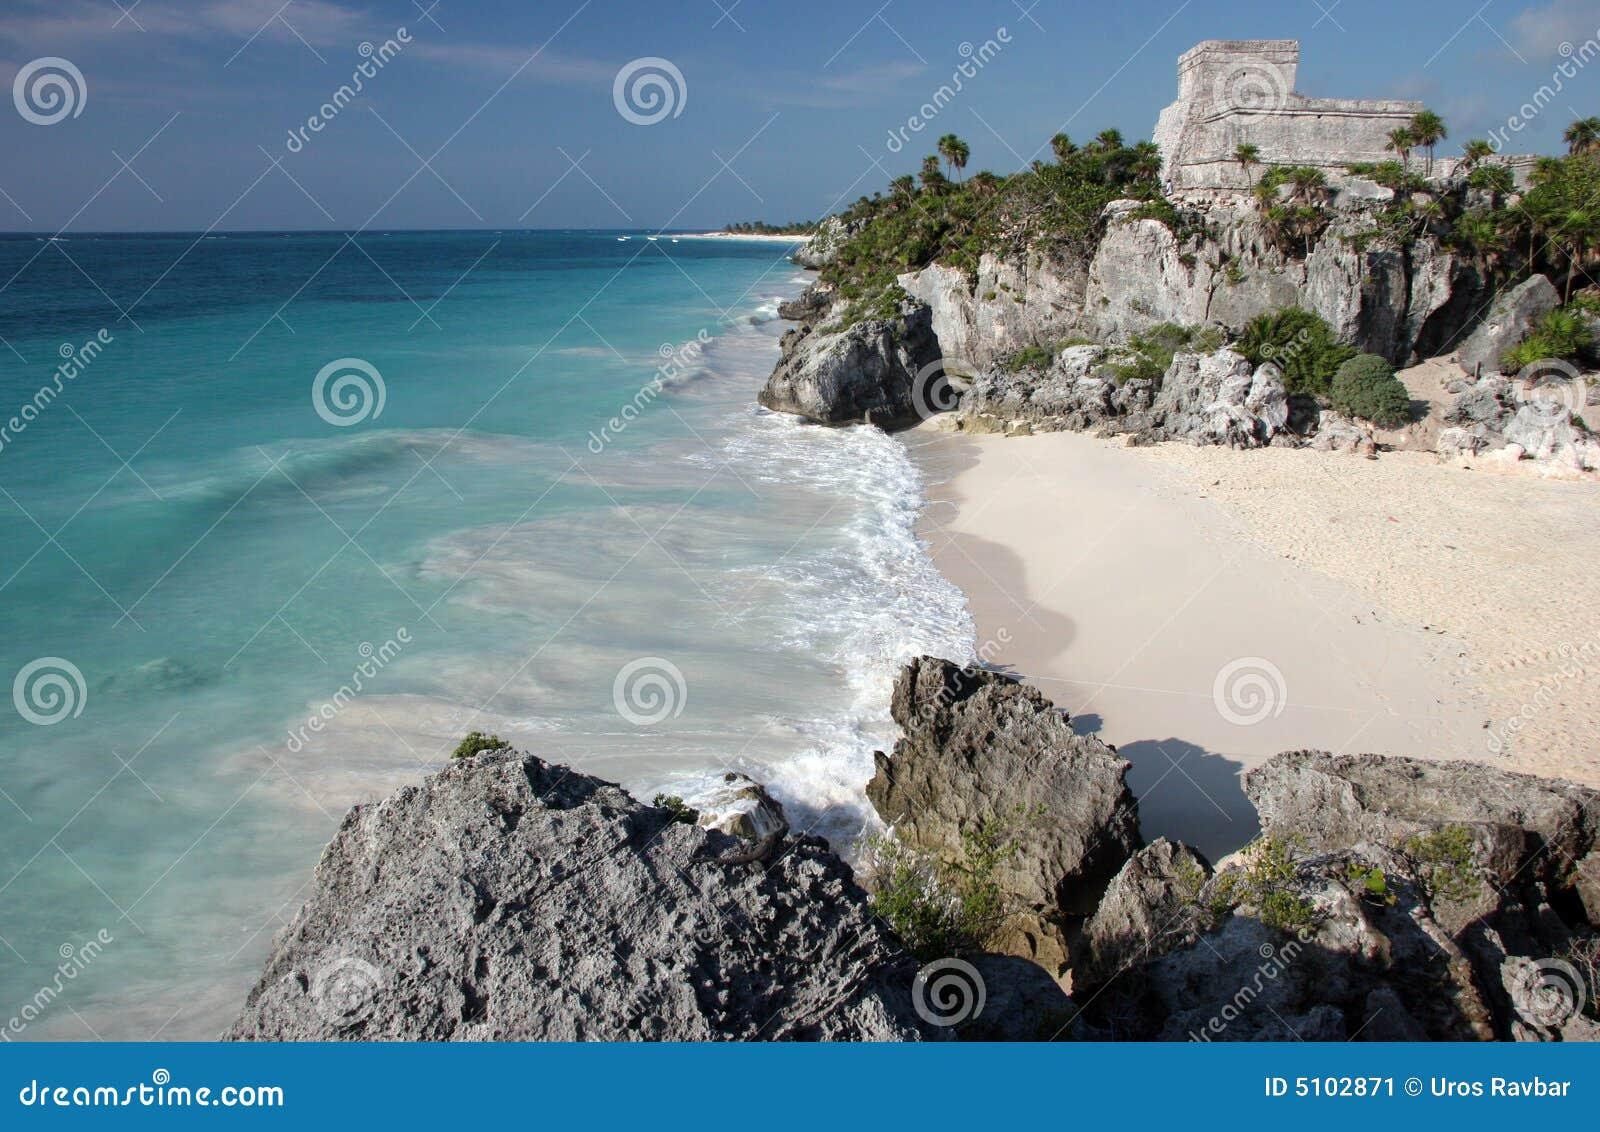 Tulum ruins with sandy beach